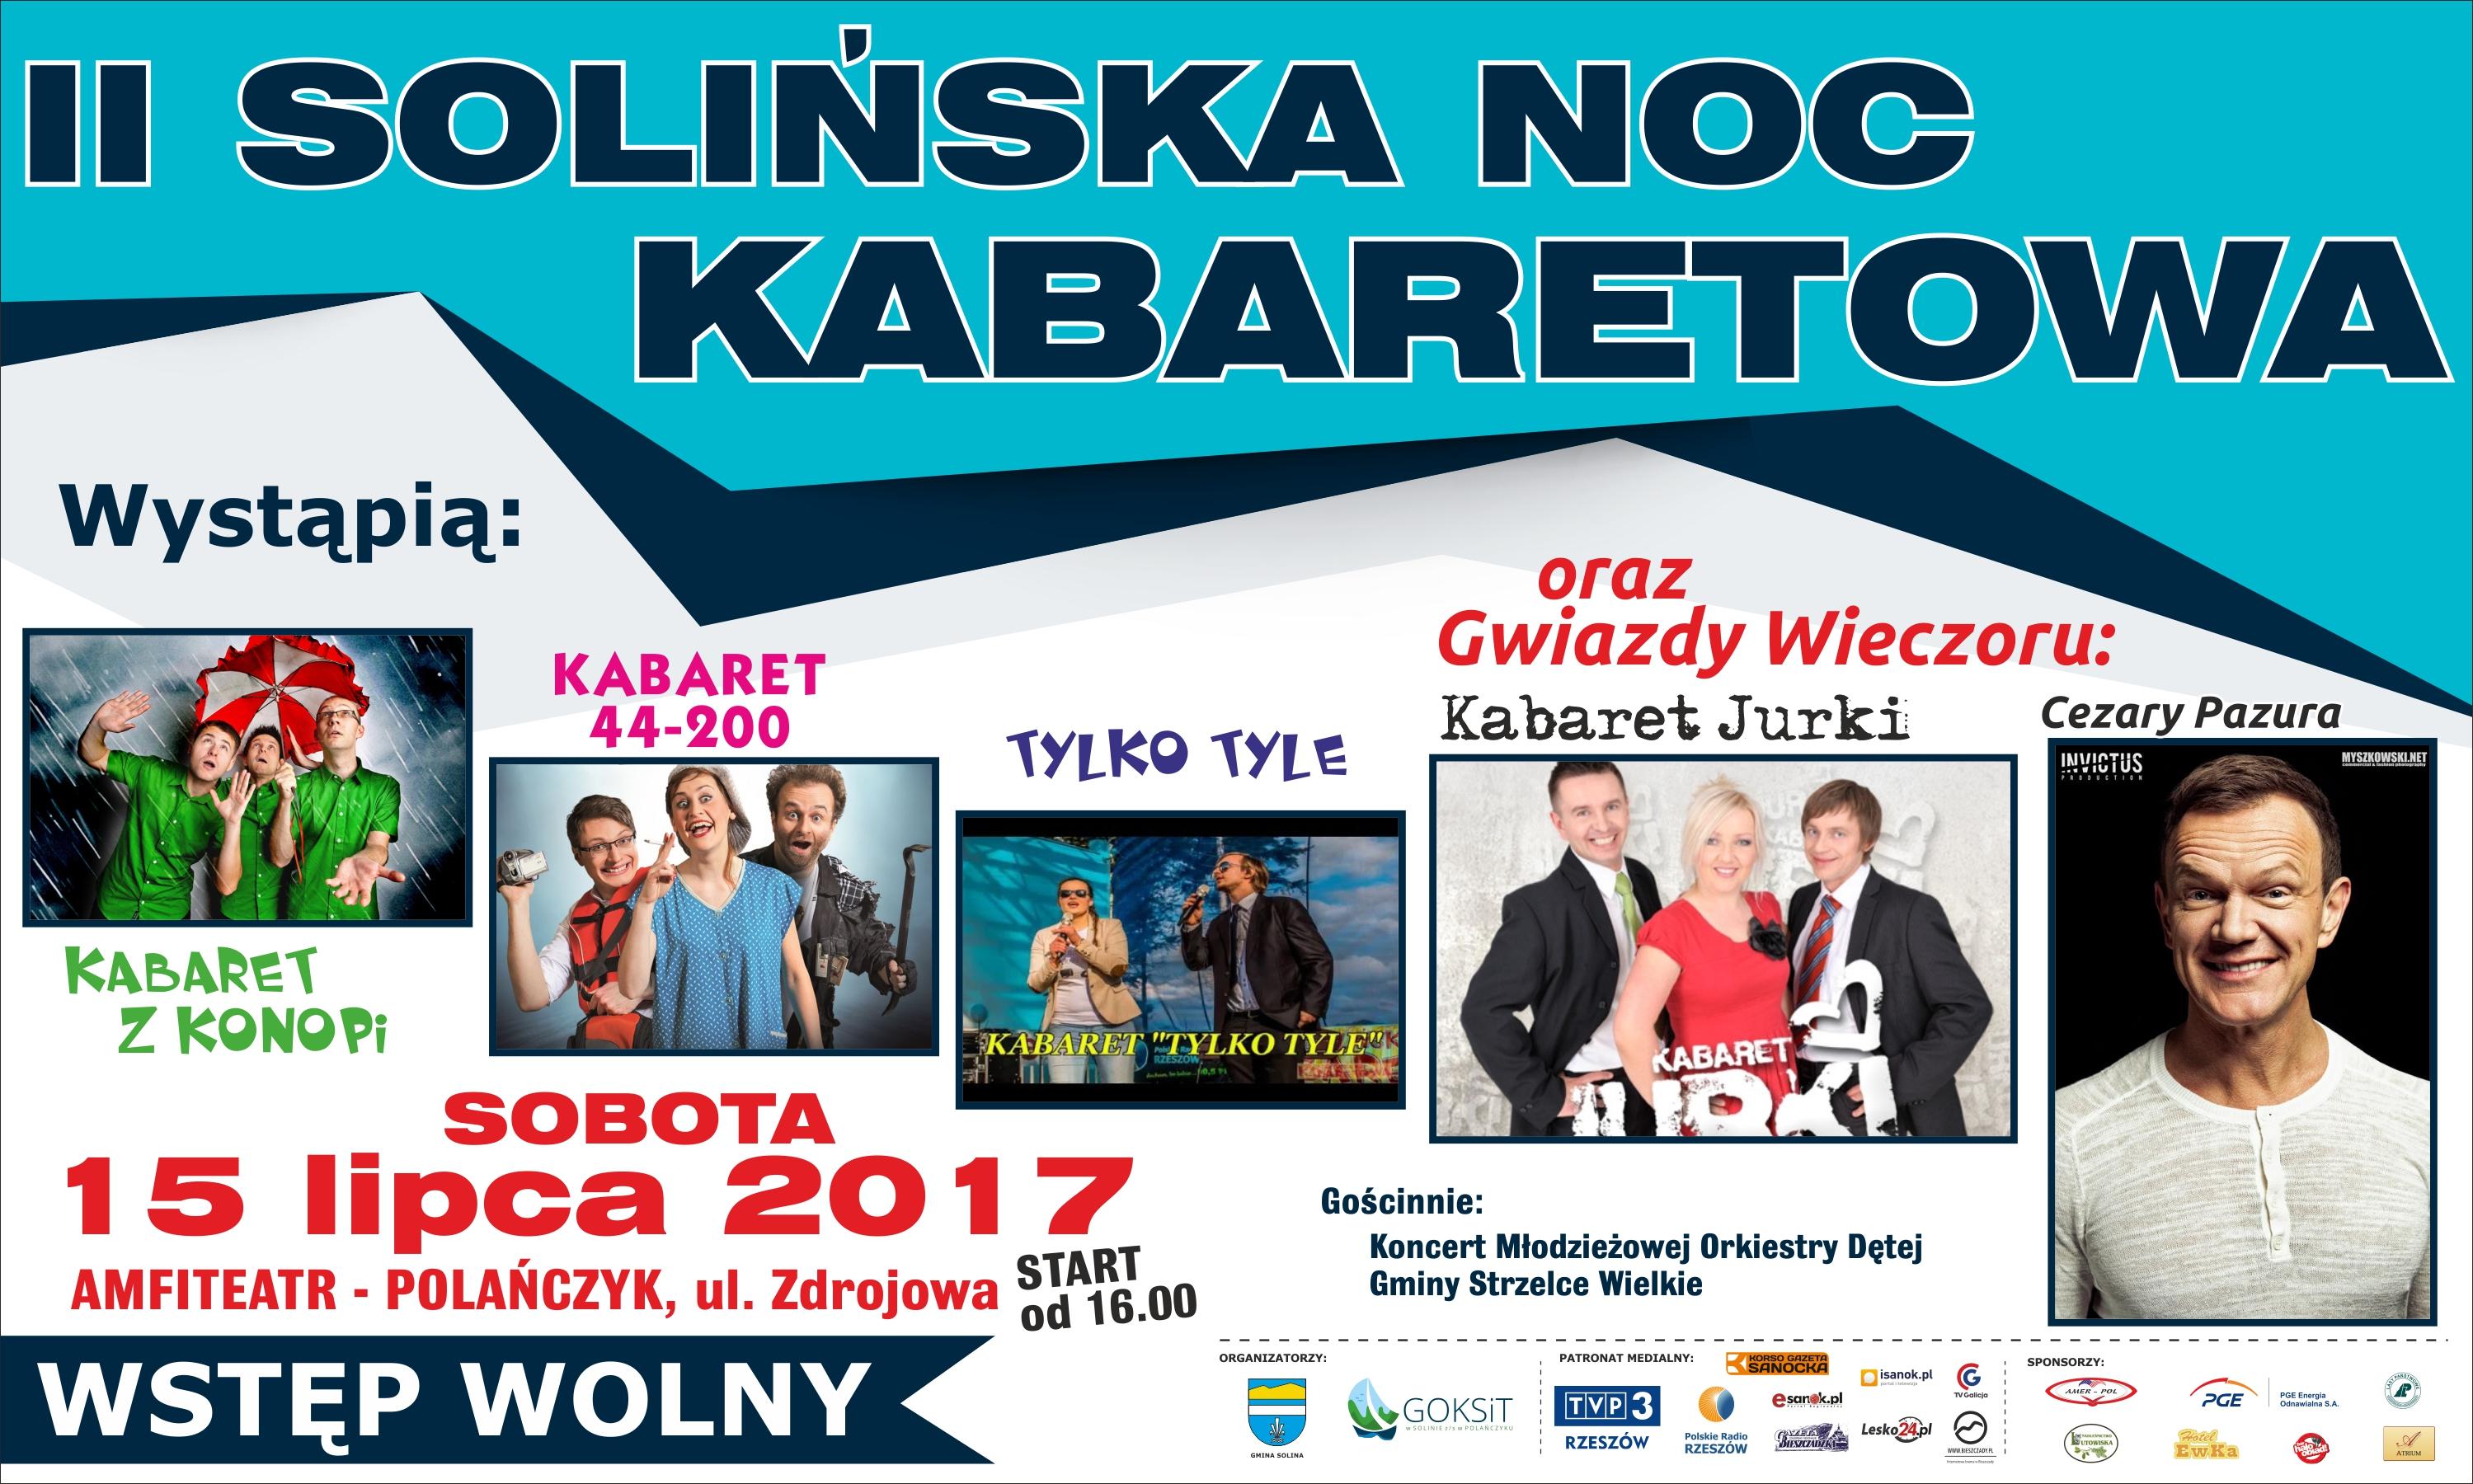 Solińska-Noc-Kabaretowa-05-2017-1